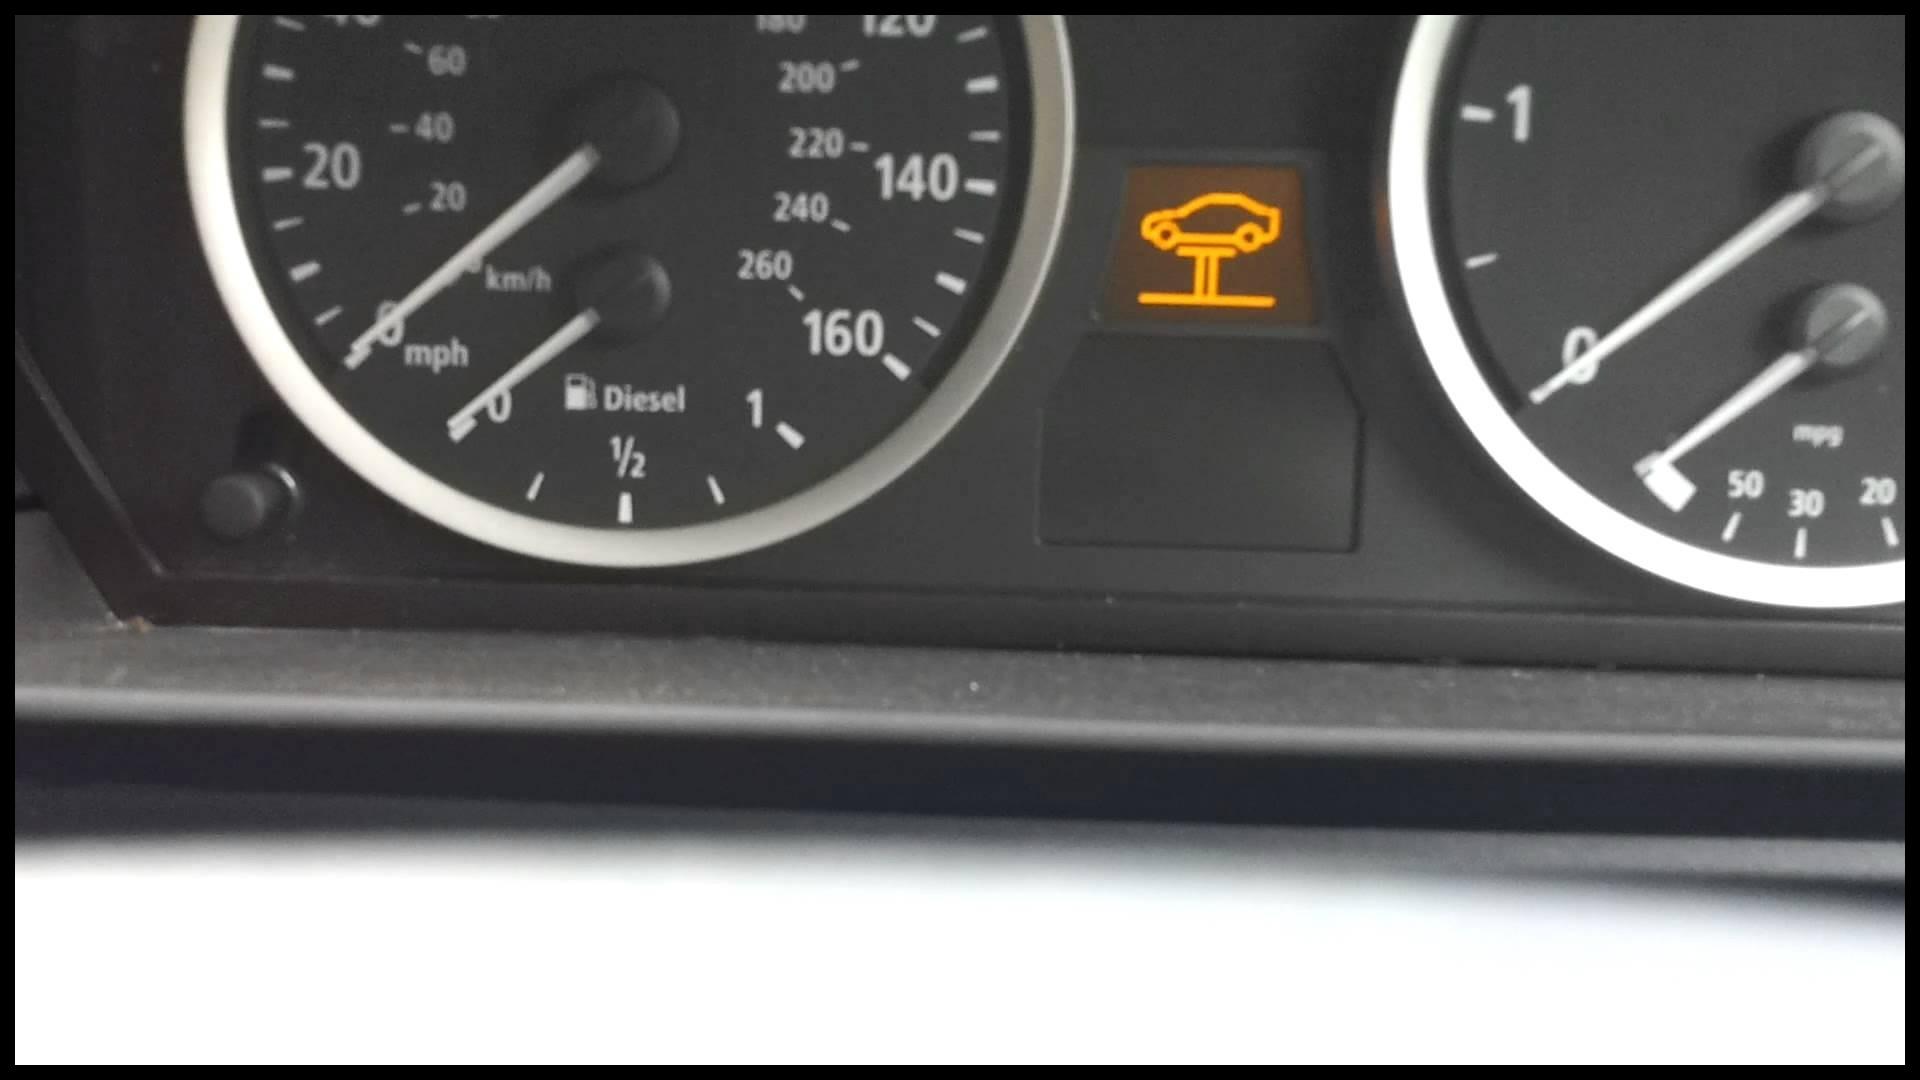 2006 Bmw 750i Transmission Fault Drive Moderately Lovely Bmw 530d E60 2004 Transmission Fault I Inne